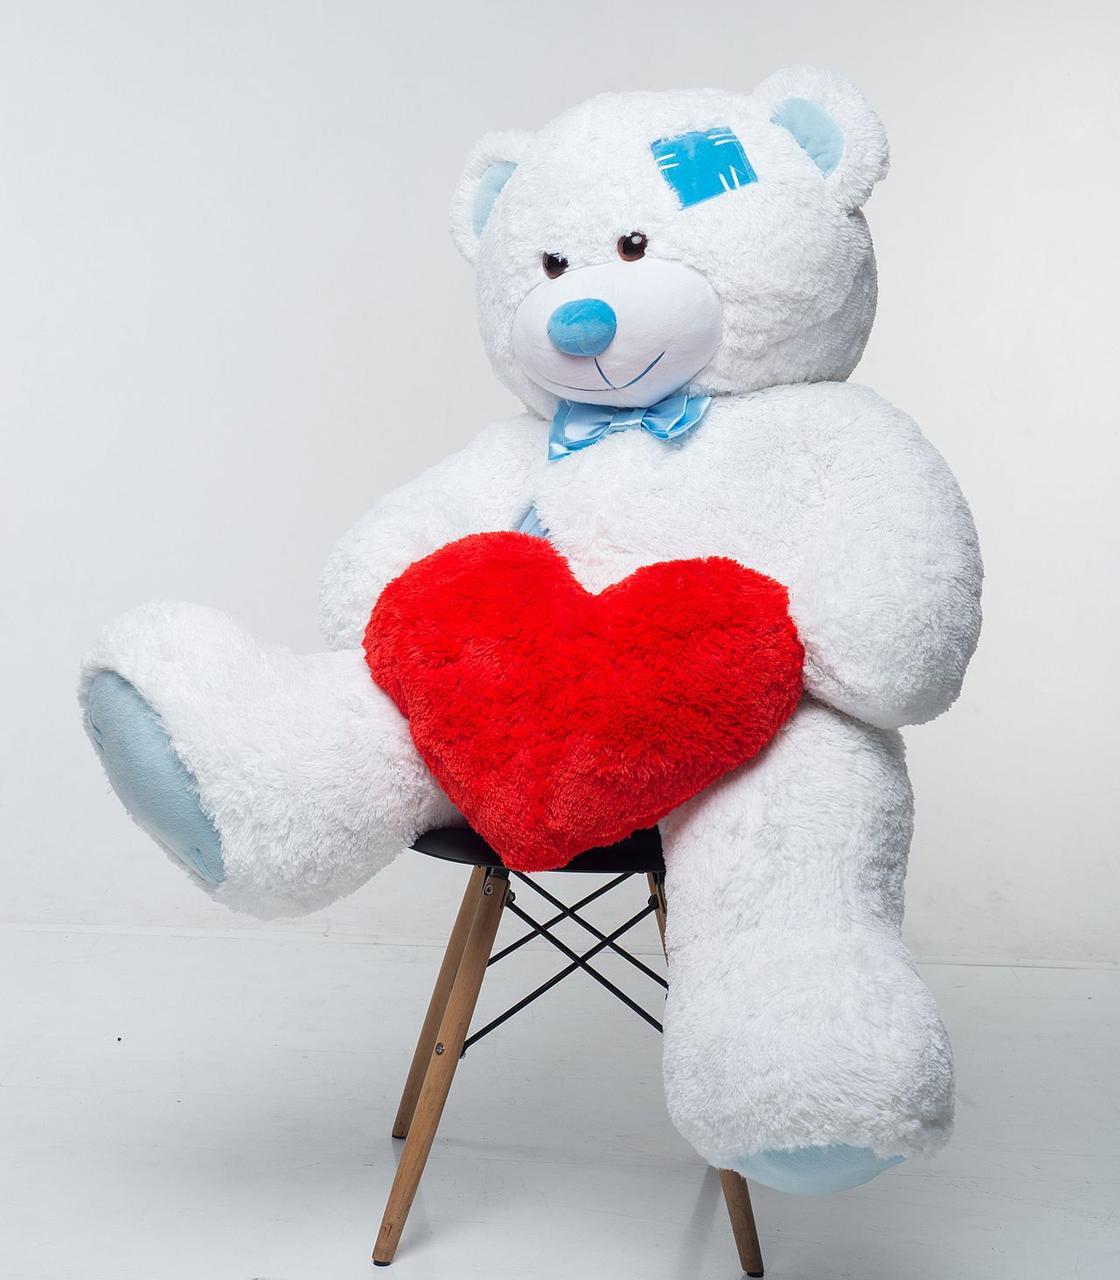 Плюшевий ведмедик із серцем Mister Medved Латки Білий 150 см